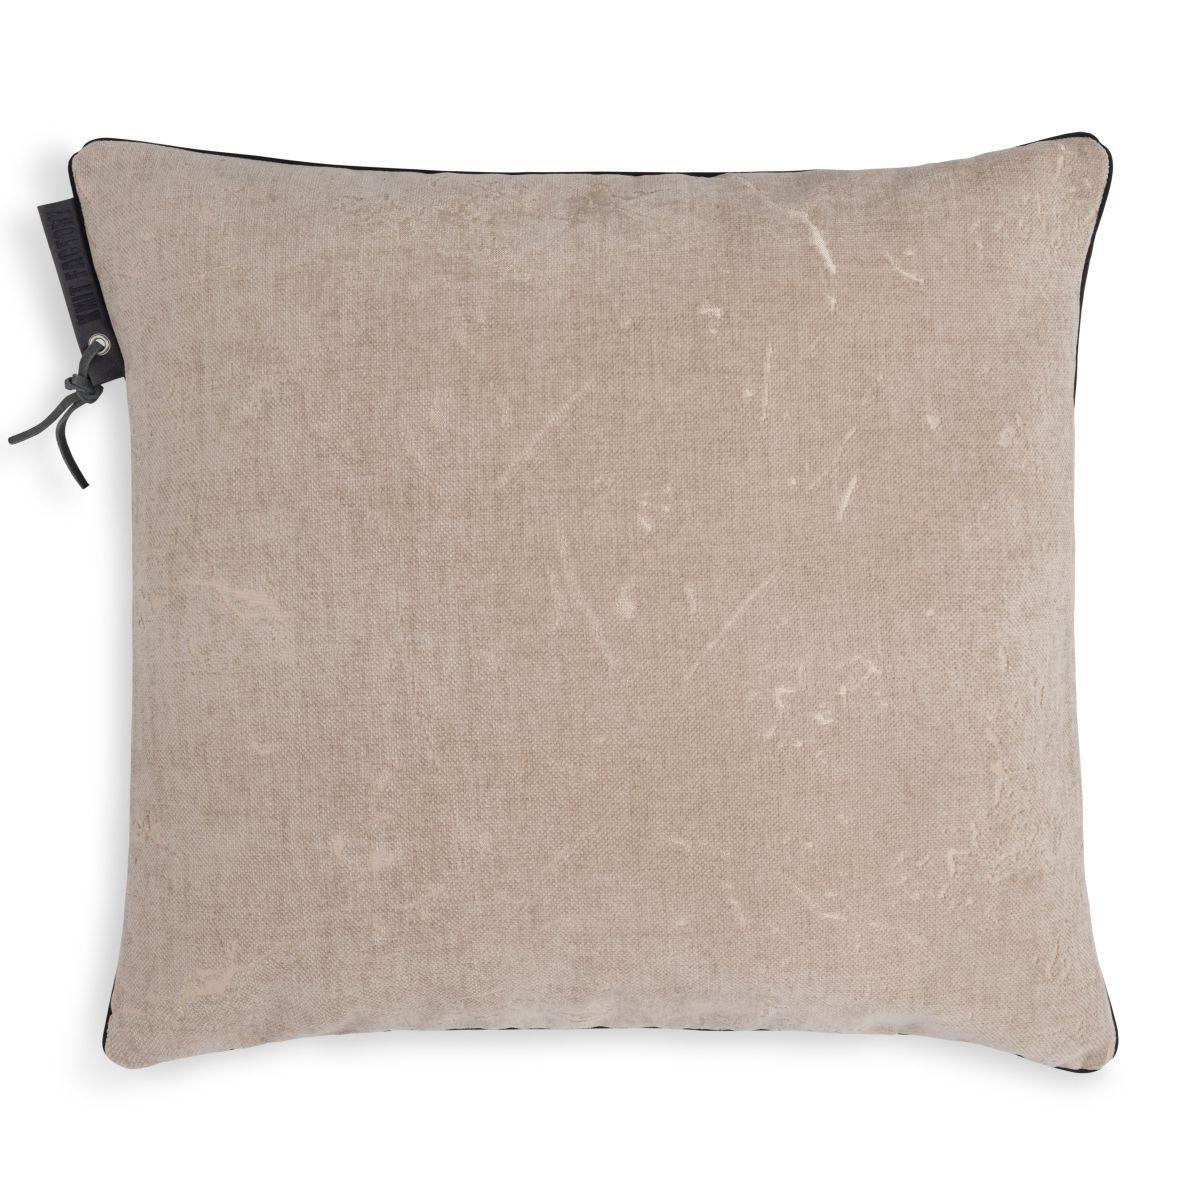 james cushion beige 50x50